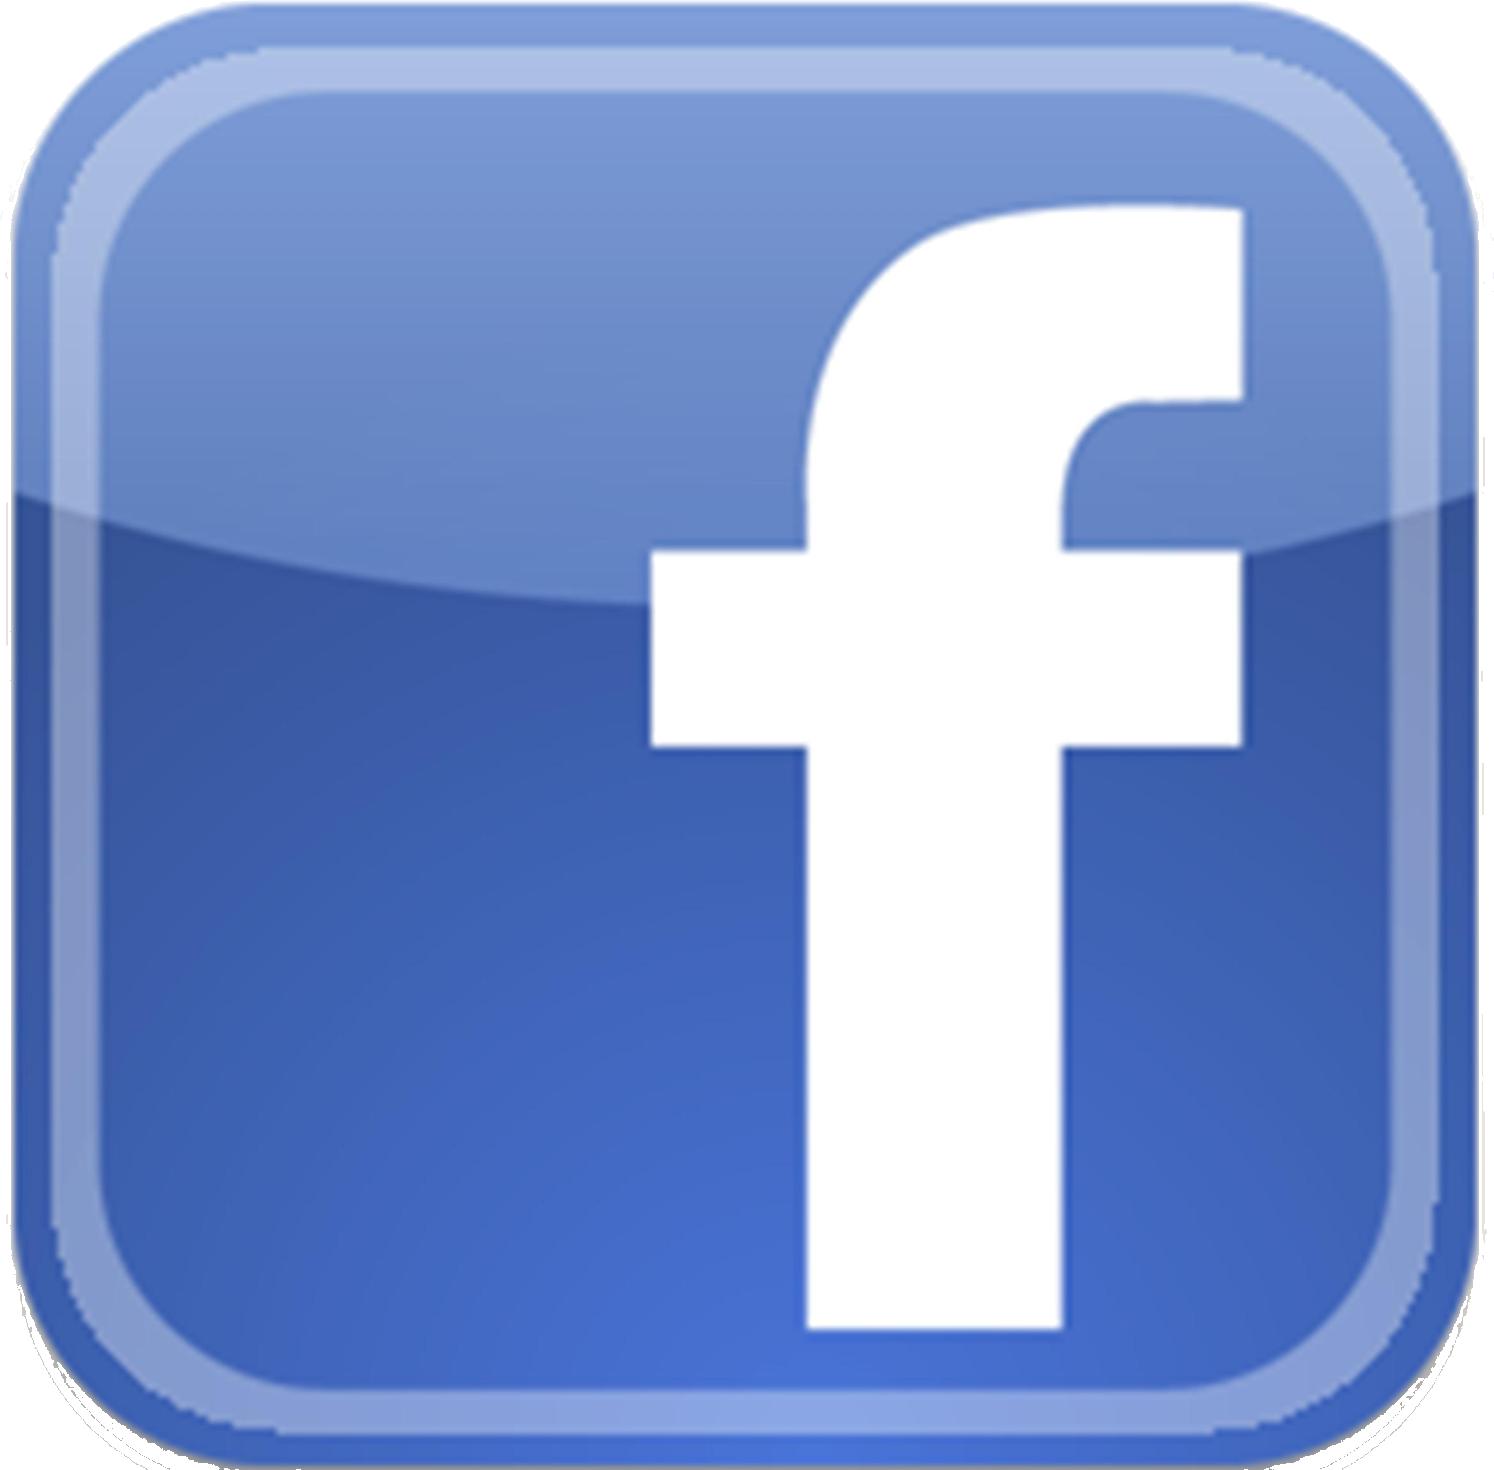 http://www.facebook.com/abdatdah